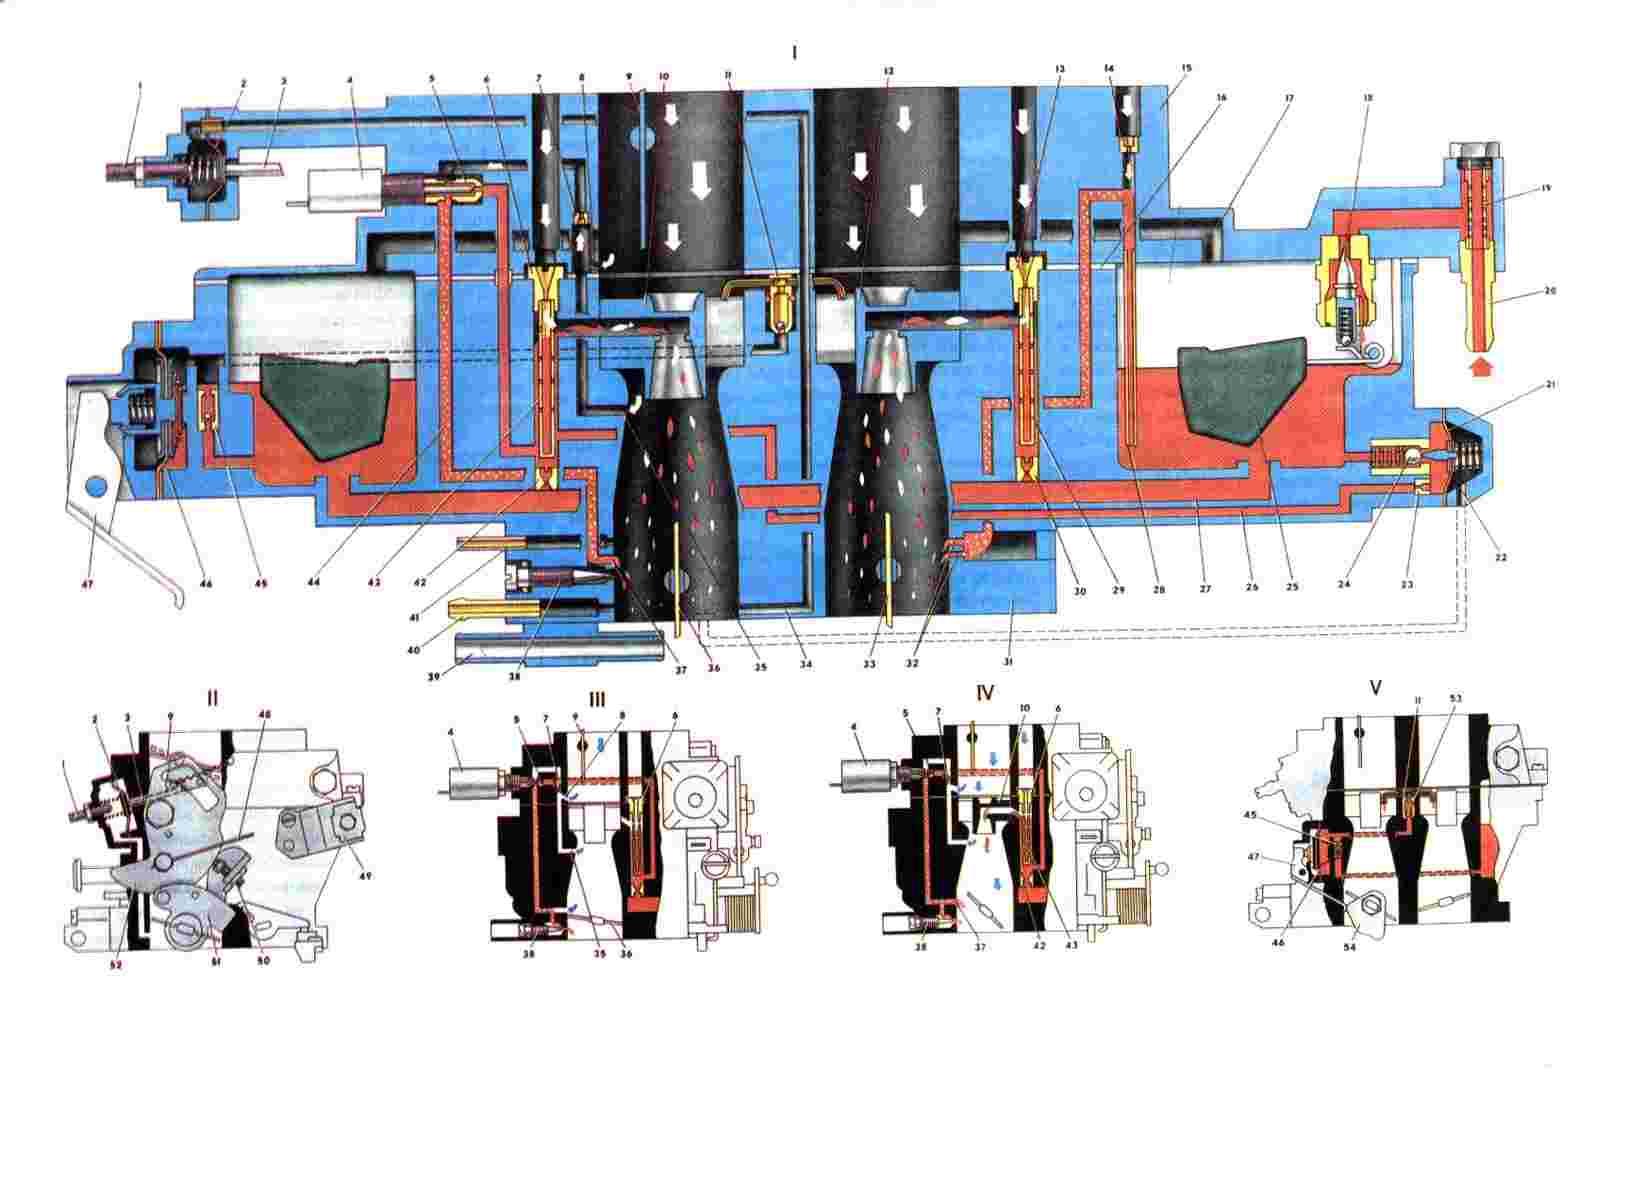 Клапан холостого хода ваз 2107 карбюратор схема